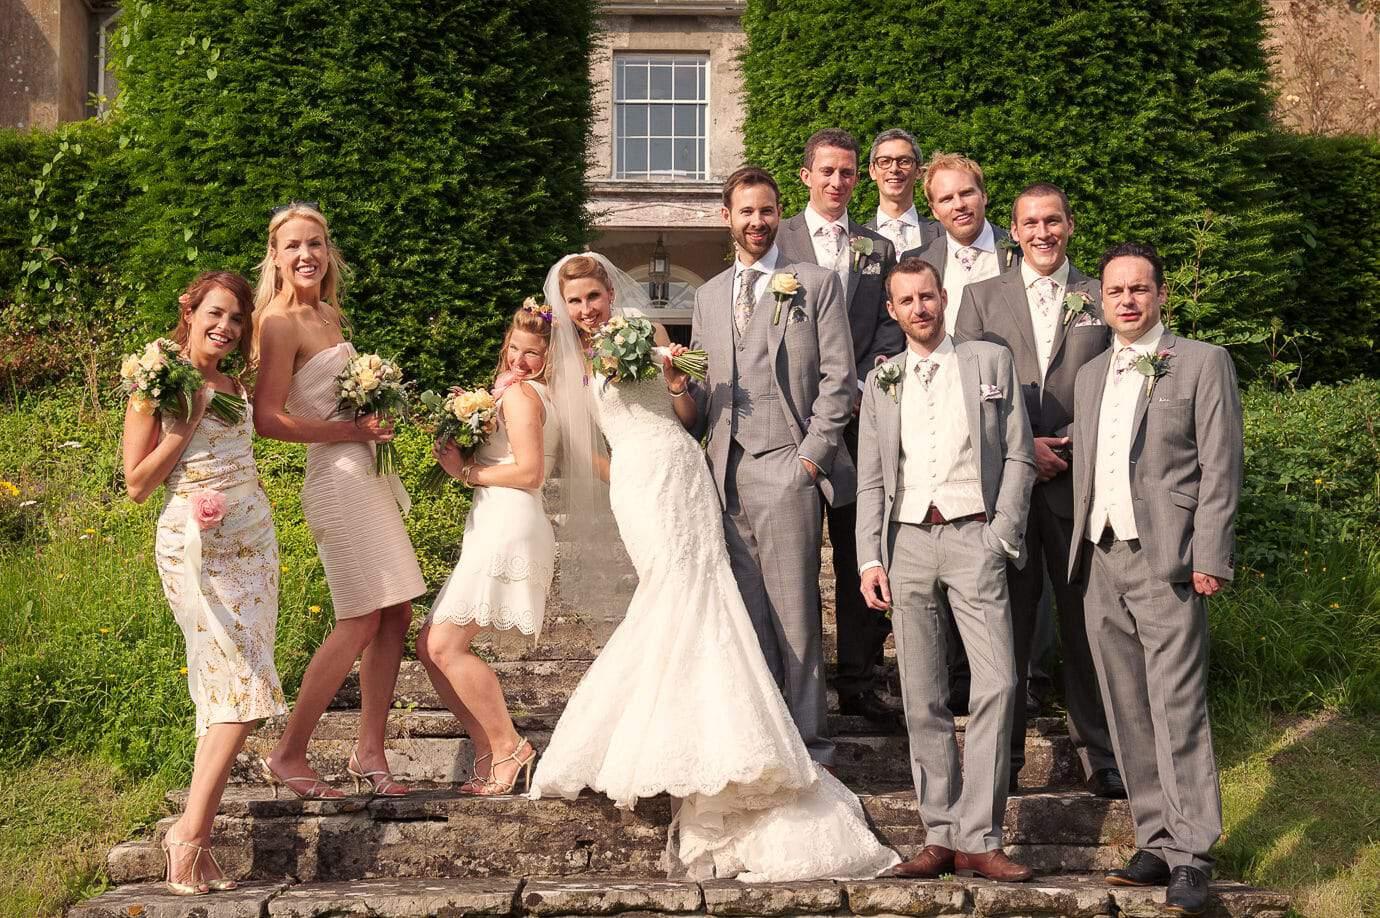 Informal wedding group photograph outside Plush Manor wedding venue